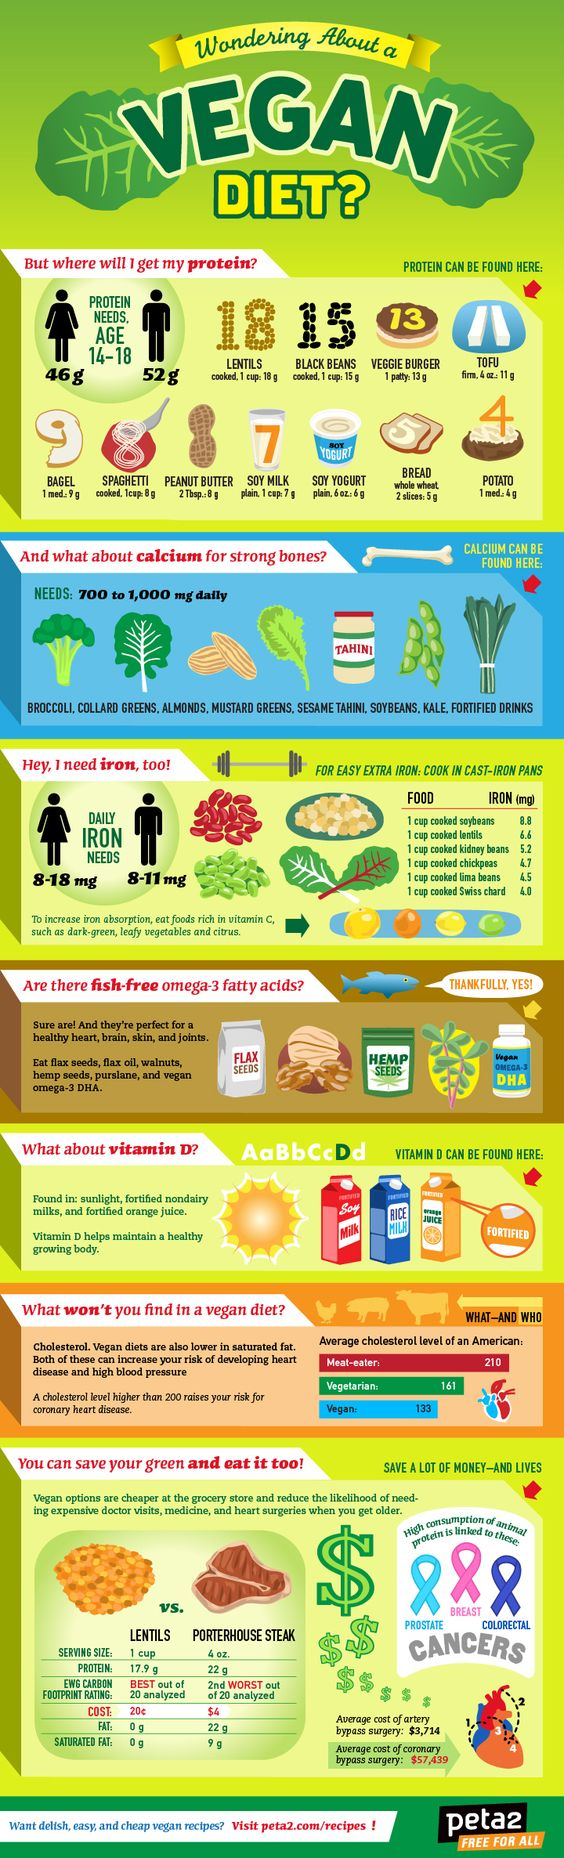 "peta2 ""Wondering About A Vegan Diet?"" inforgraphic"